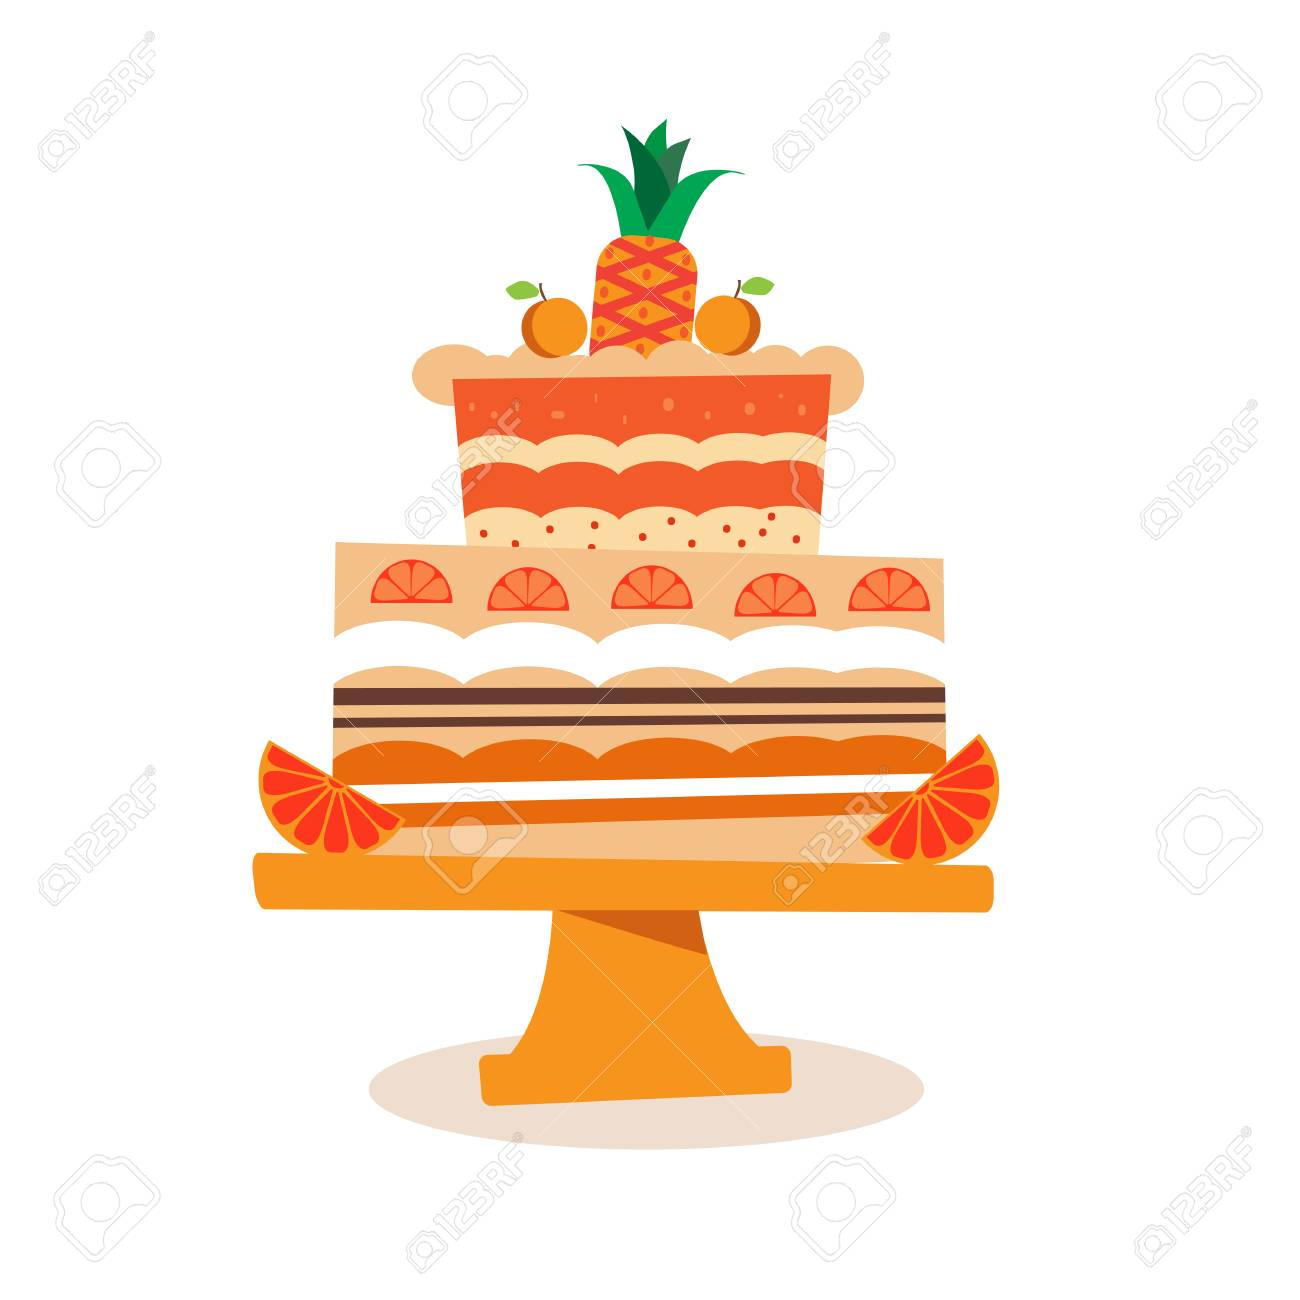 Beautiful Chocolate Birthday Cake In Cartoon Style Vector Royalty